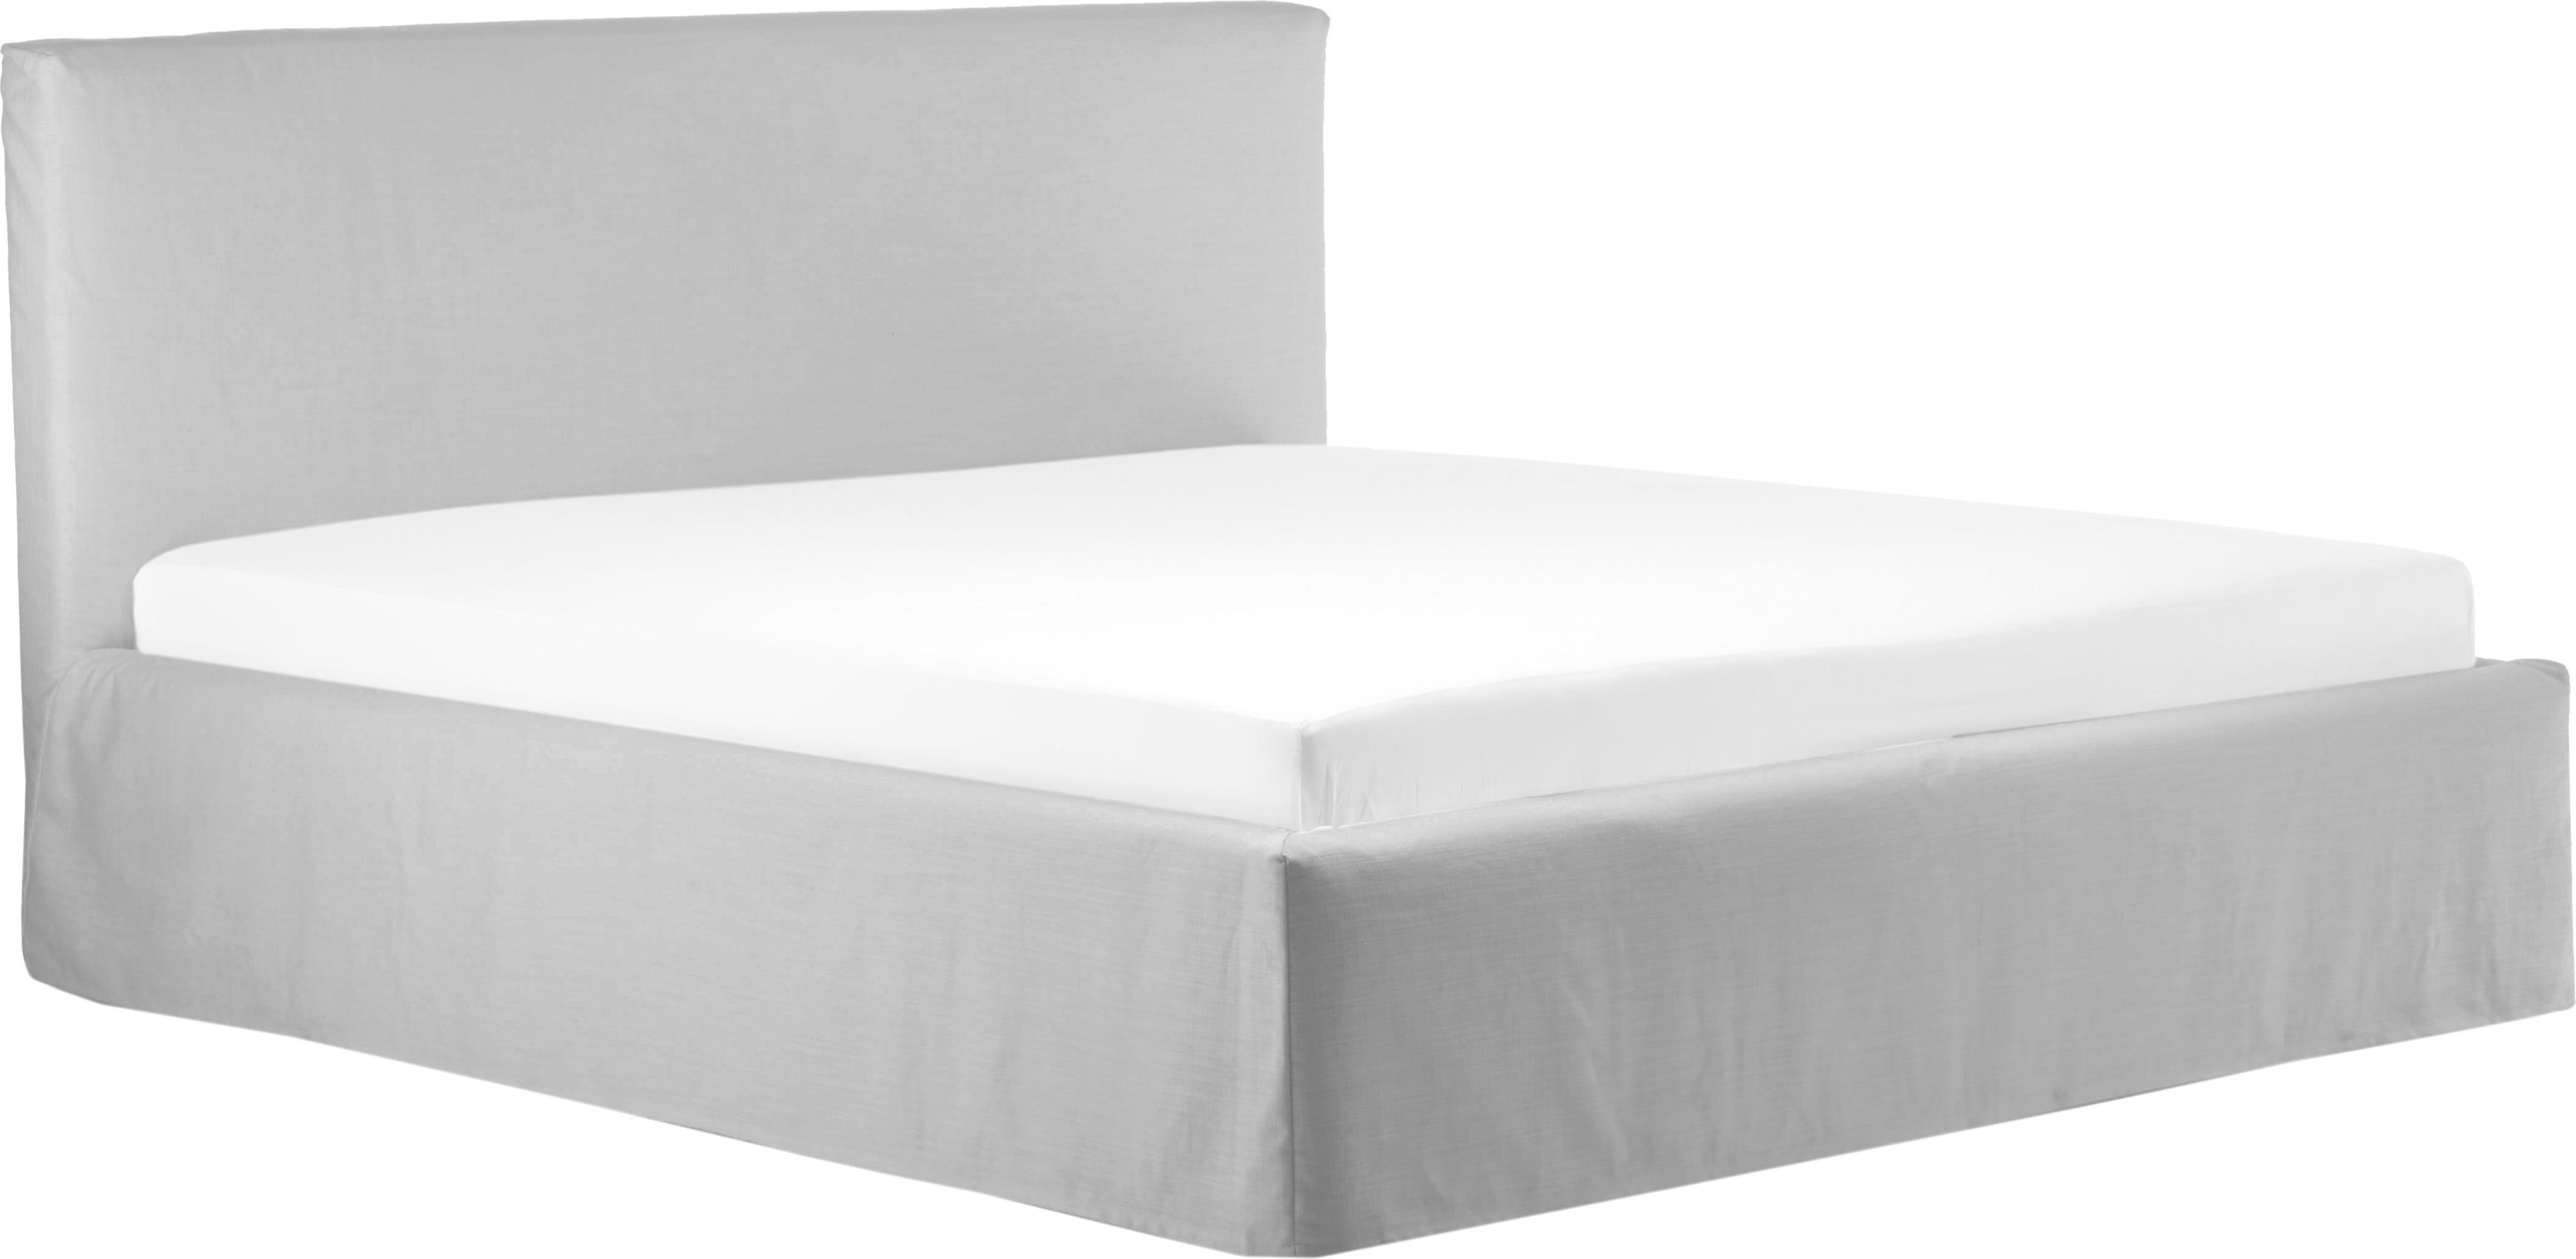 Gestoffeerd bed Feather met opbergfunctie, Frame: massief grenenhout, Bekleding: polyester (structuurmater, Lichtgrijs, 140 x 200 cm